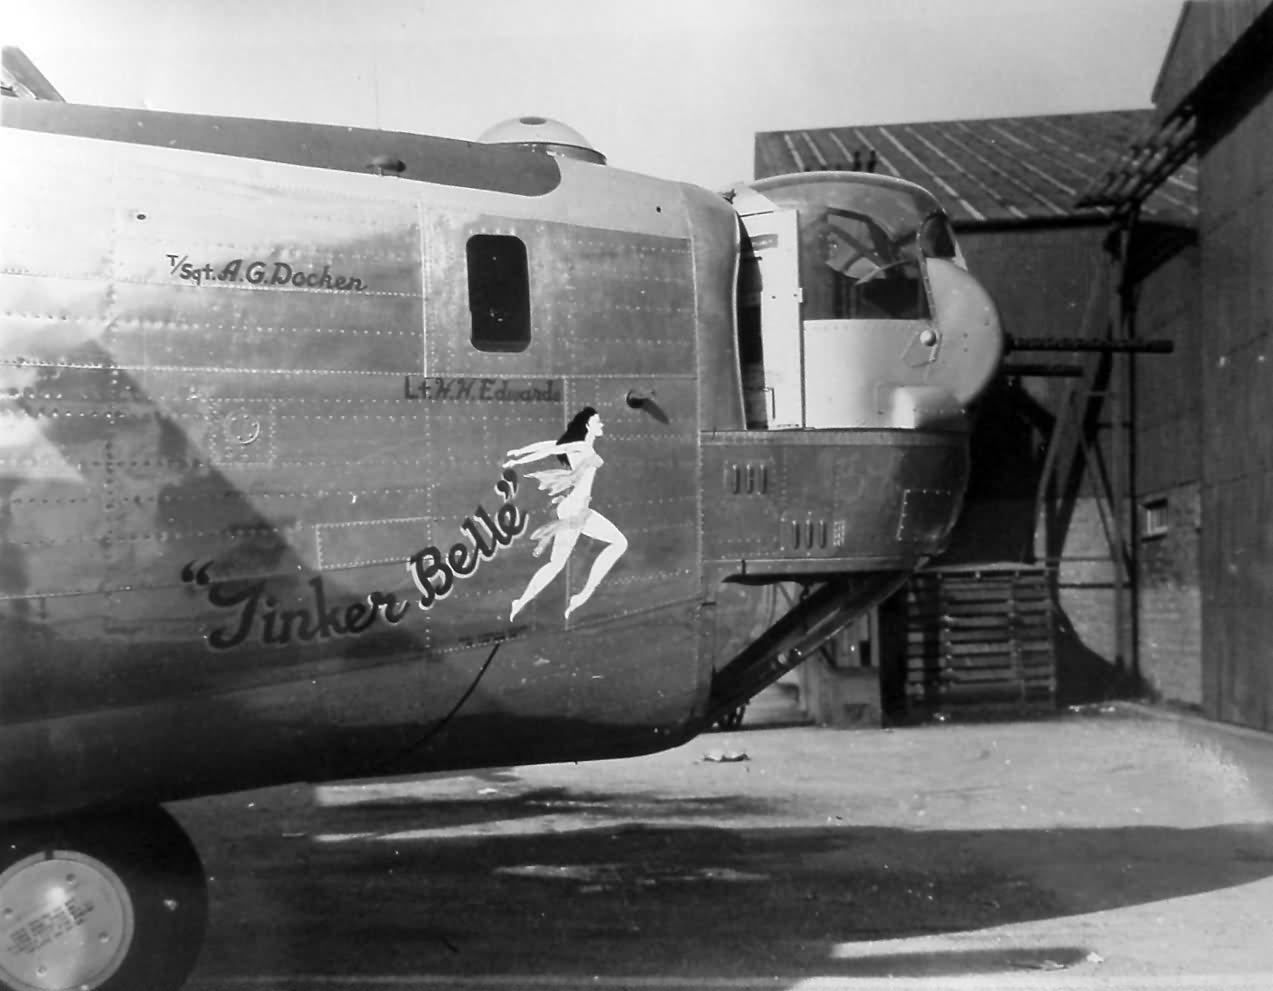 B-24 Liberator bomber Nose  B 24 Liberator Nose Art